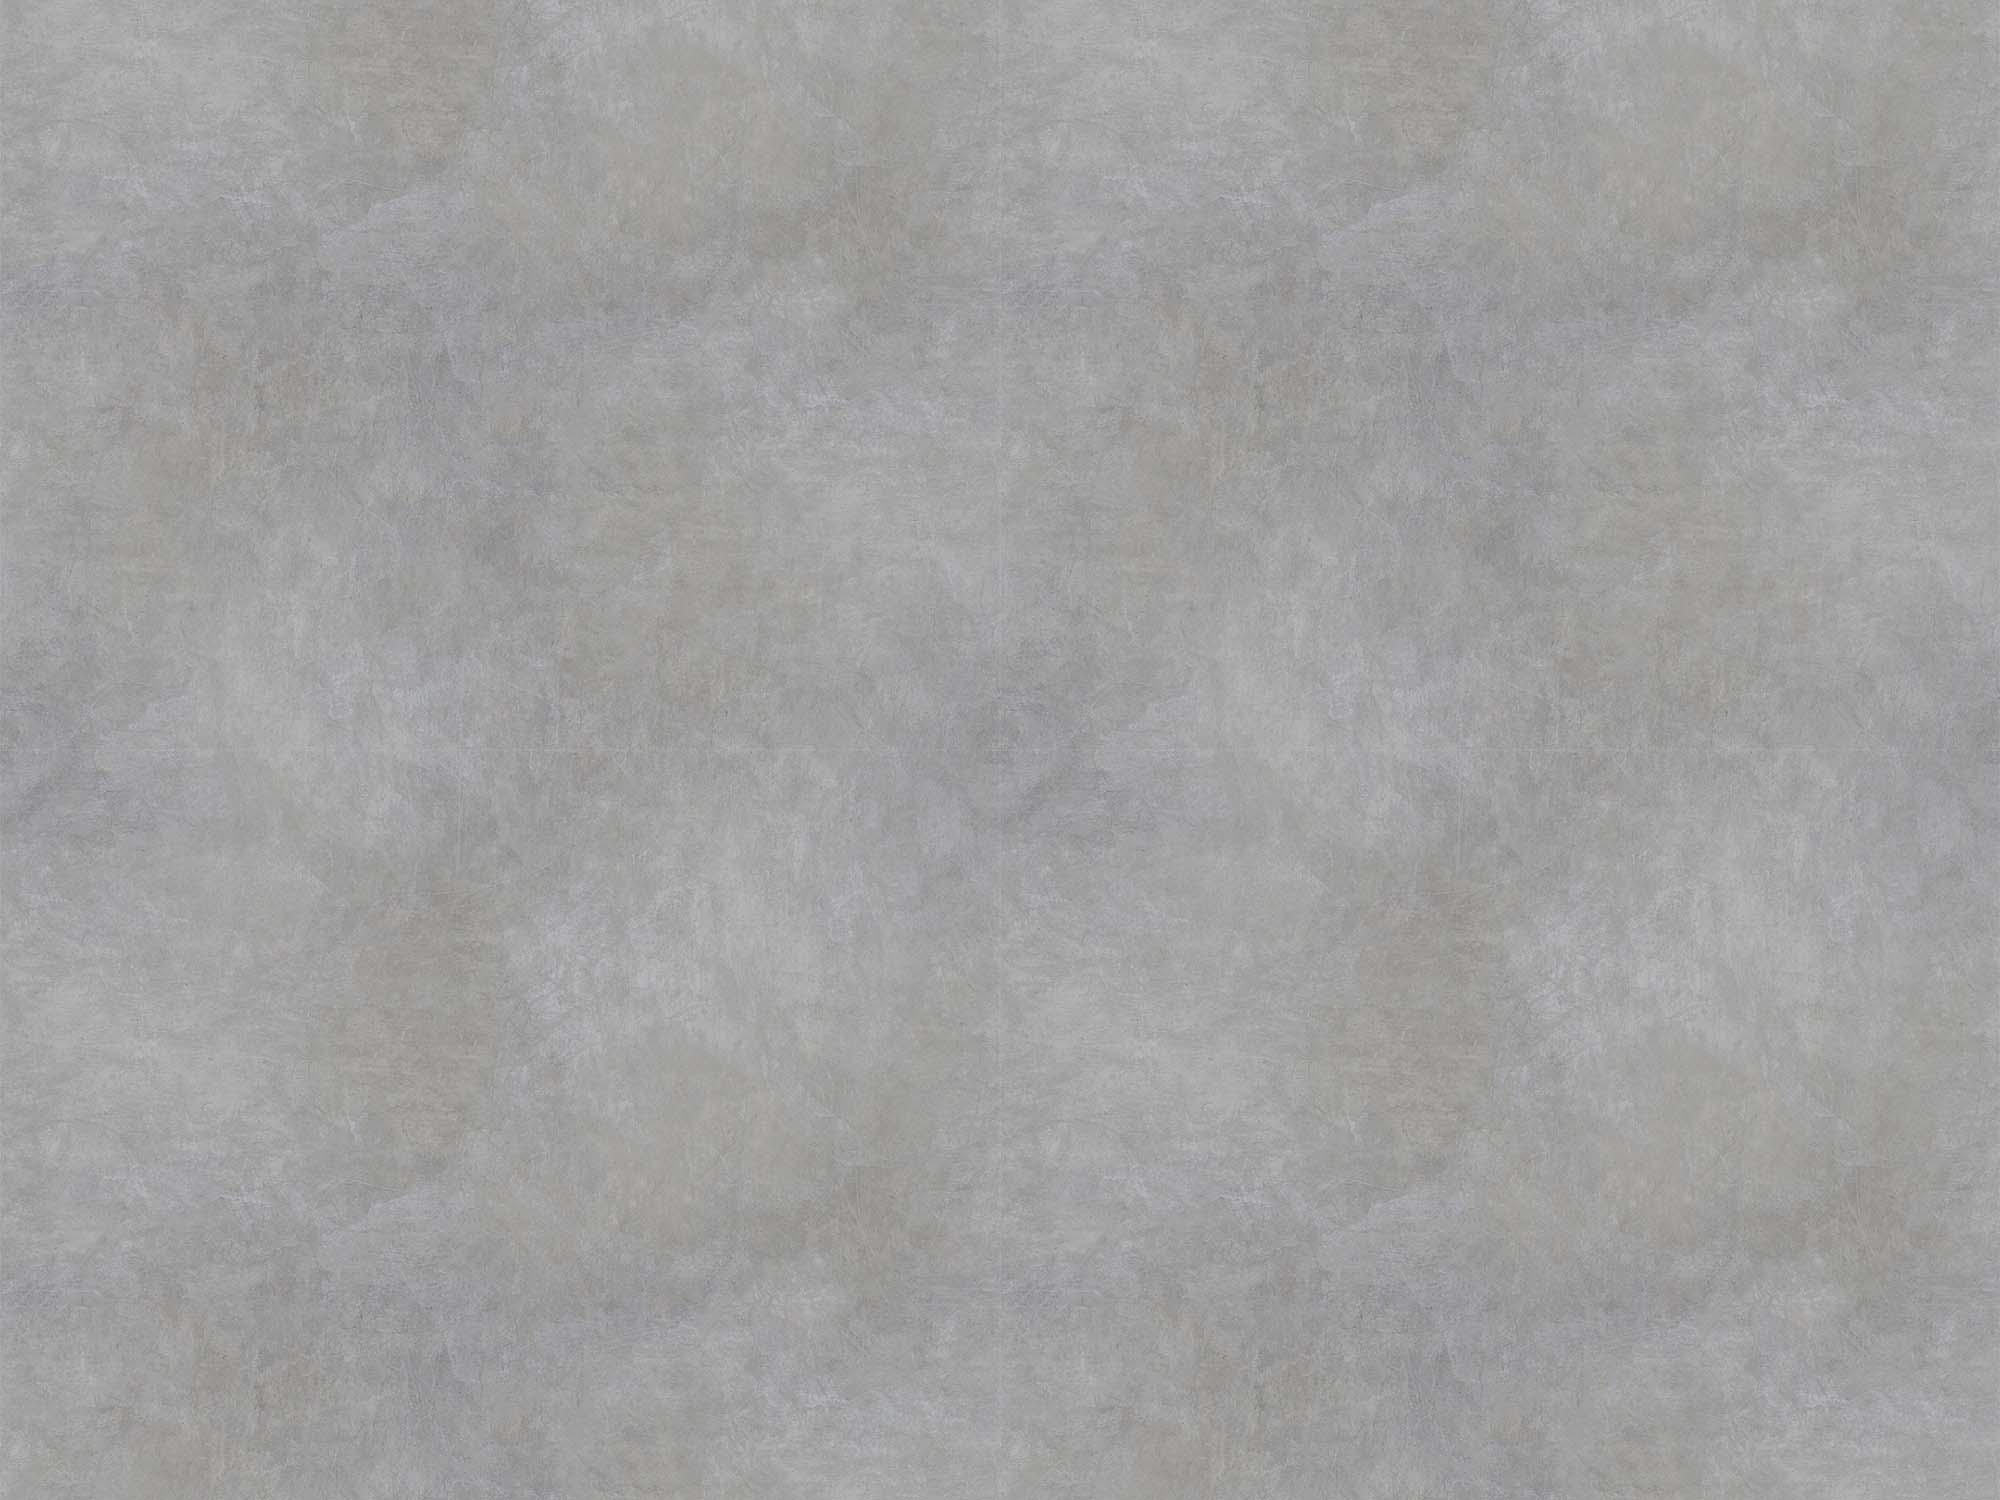 Seamless Concrete Wall Textures 1